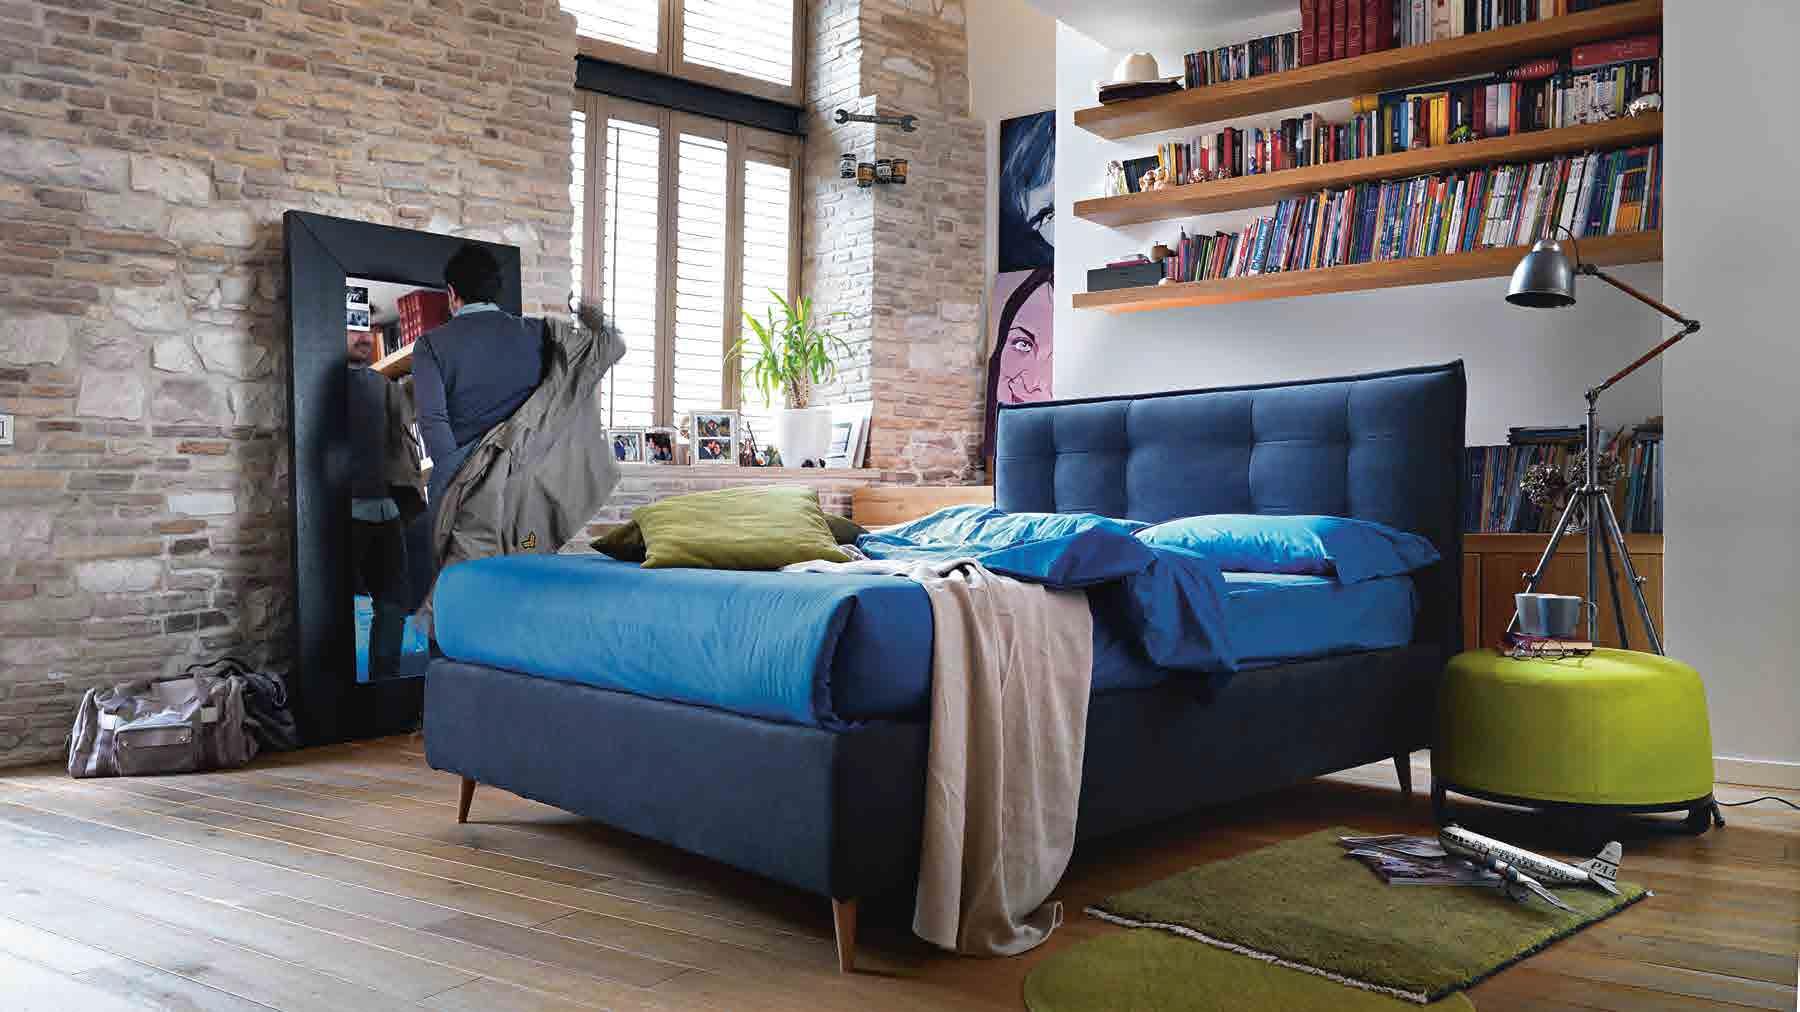 cabeceros-tapizados-general-muebles-paco-caballero-1811-5cdfdfbb16f11